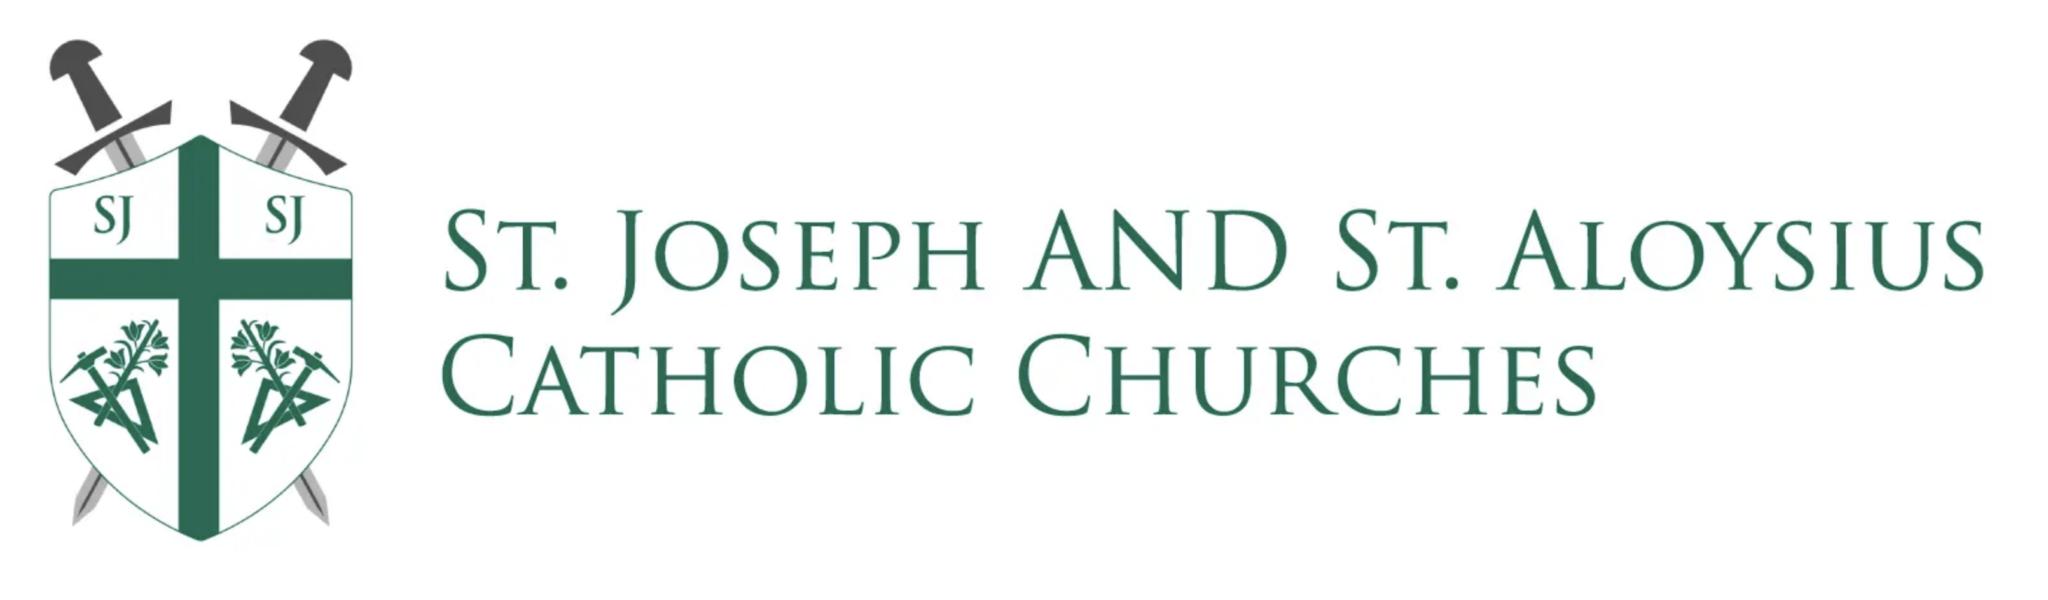 St Joseph Edina St Aloysius Baring